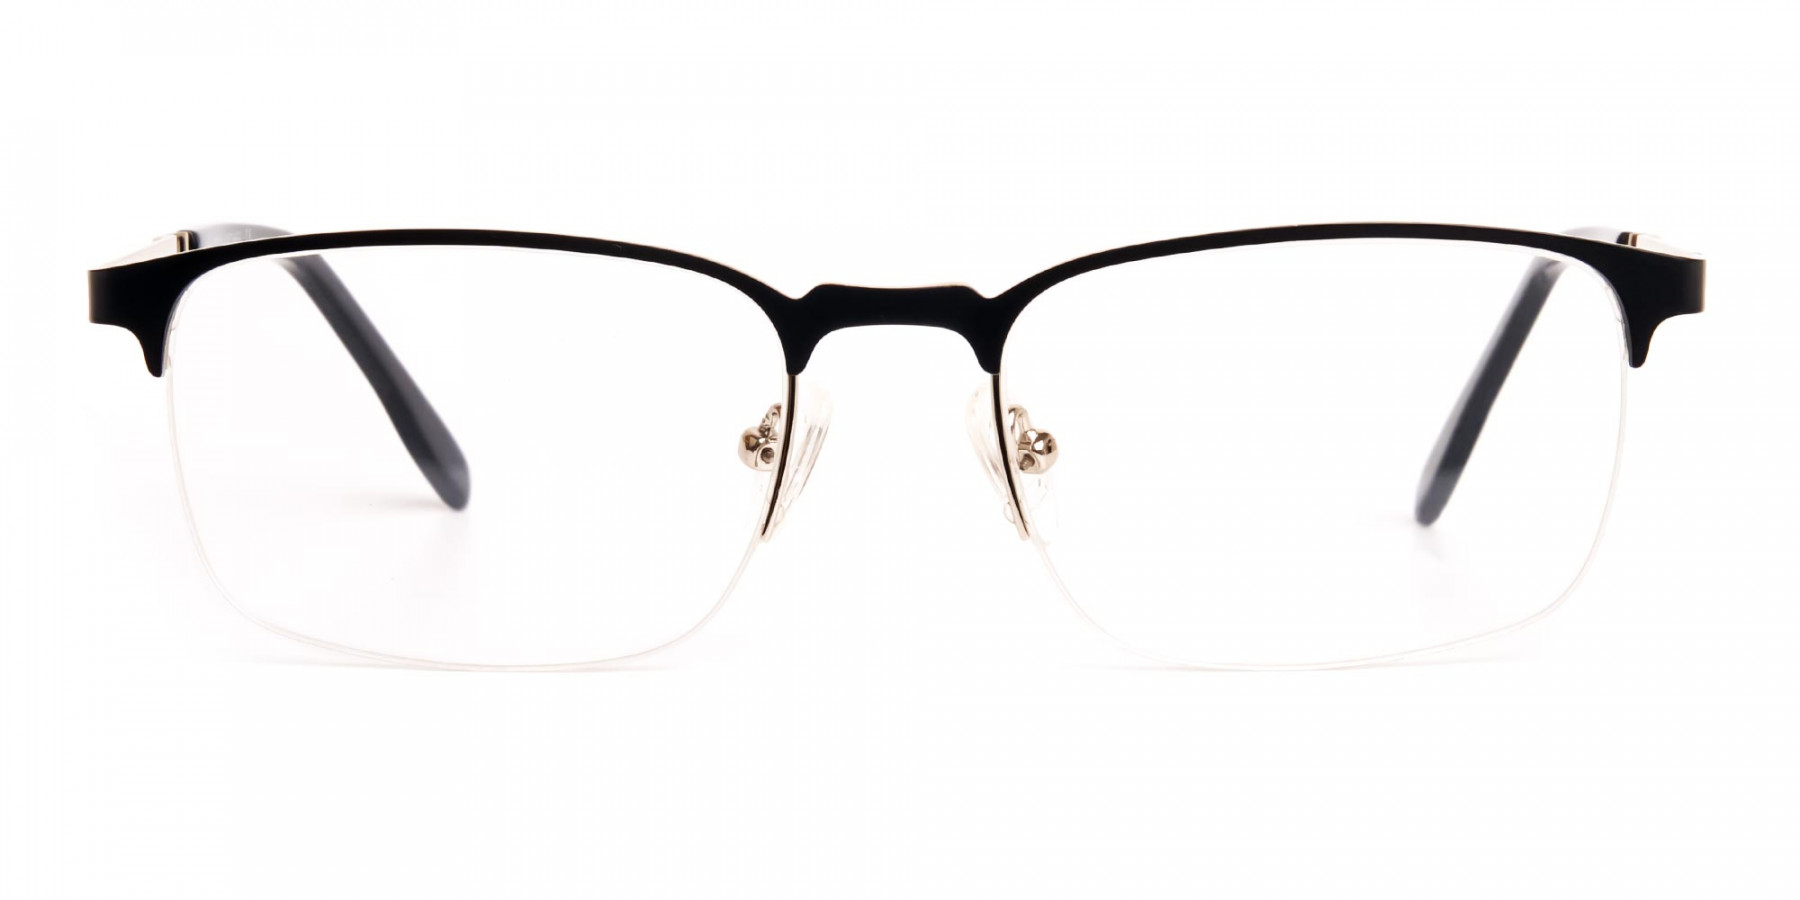 black-and-silver-rectangular-half-rim-glasses-frames-1